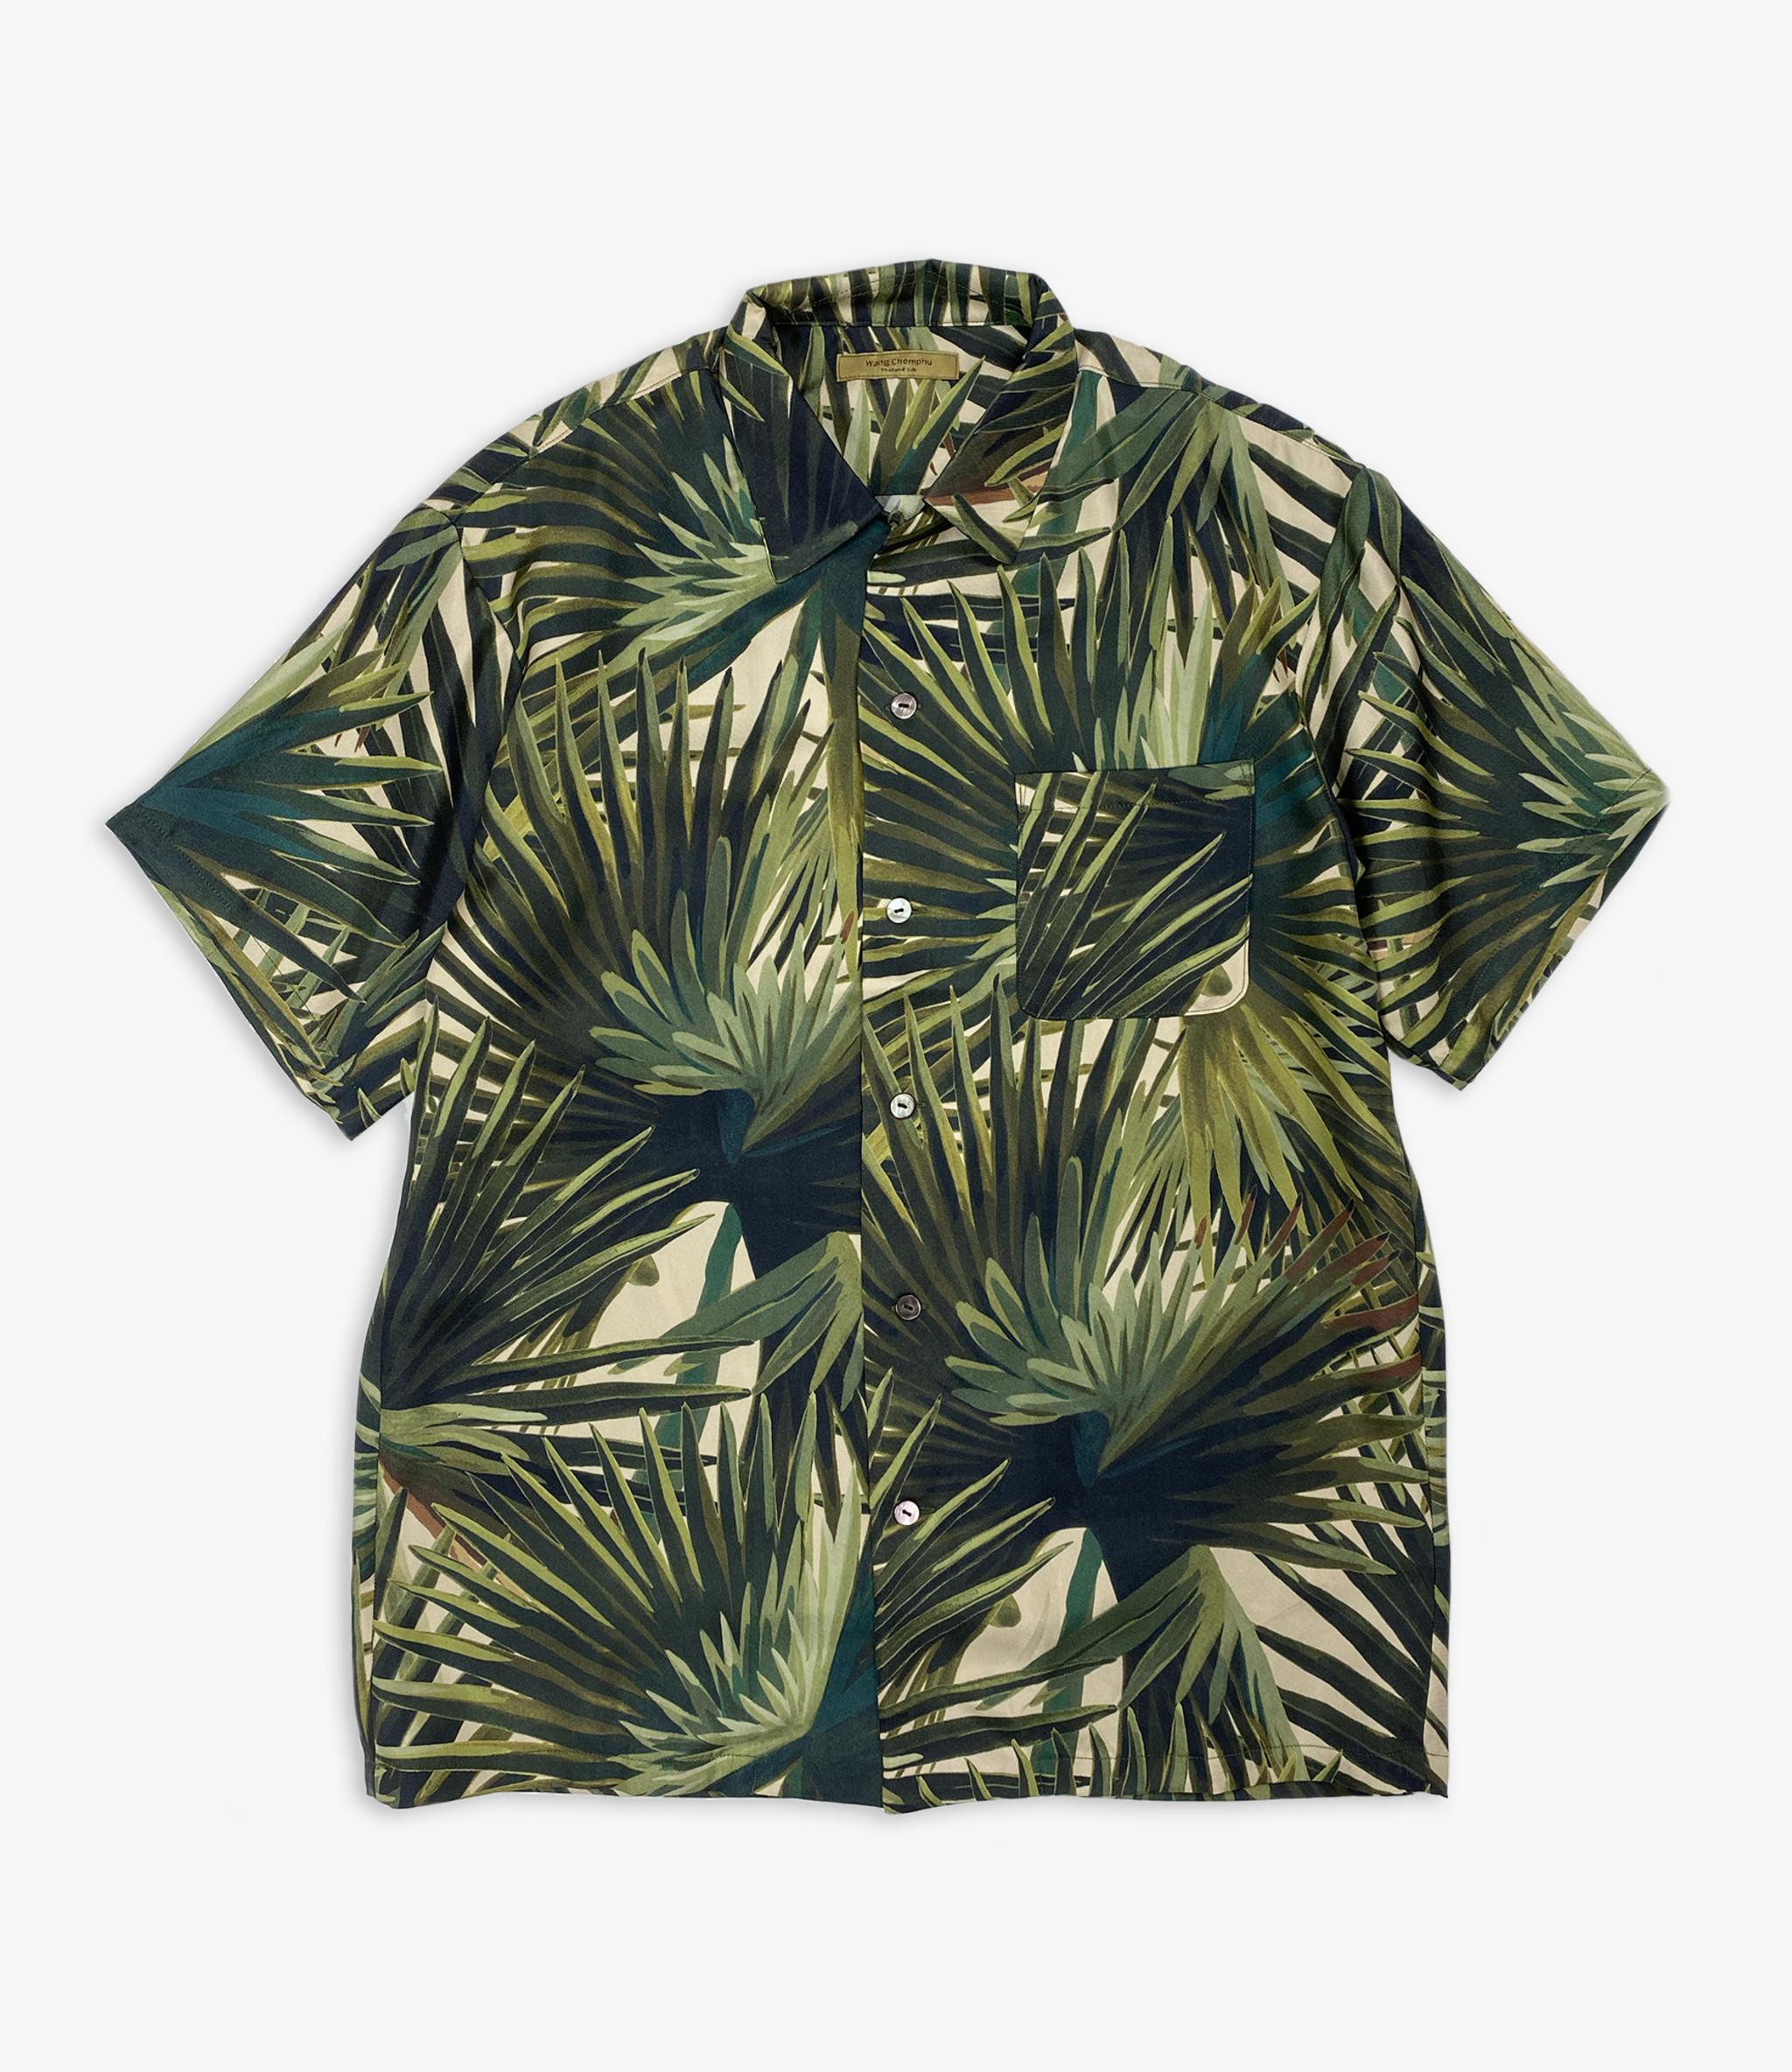 Wang Chomphu Silk SS Shirt / Pokcorpaa Sant - Borassus Flabellifer